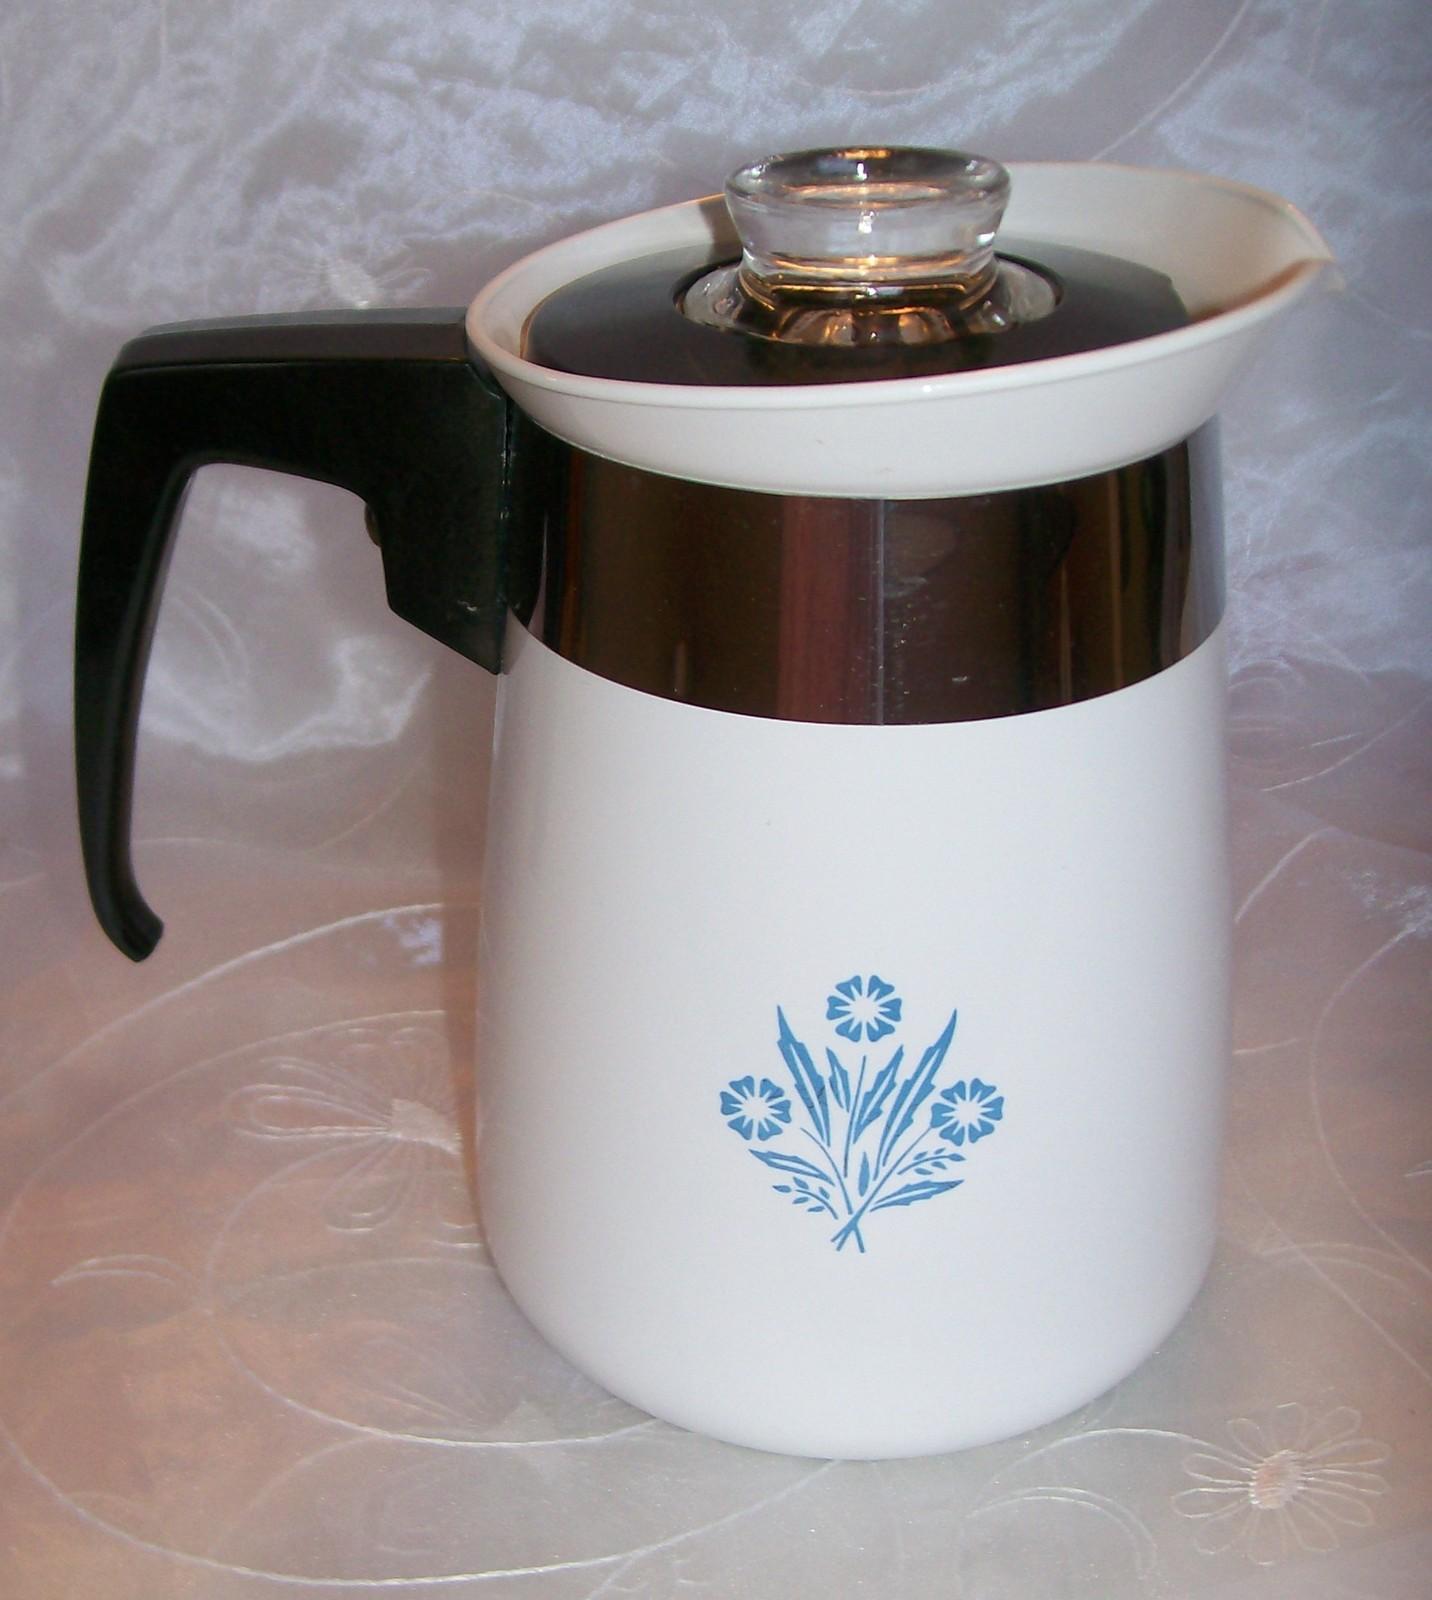 Vintage Corning Blue Cornflower Stove Top 4 Cup Coffee Pot